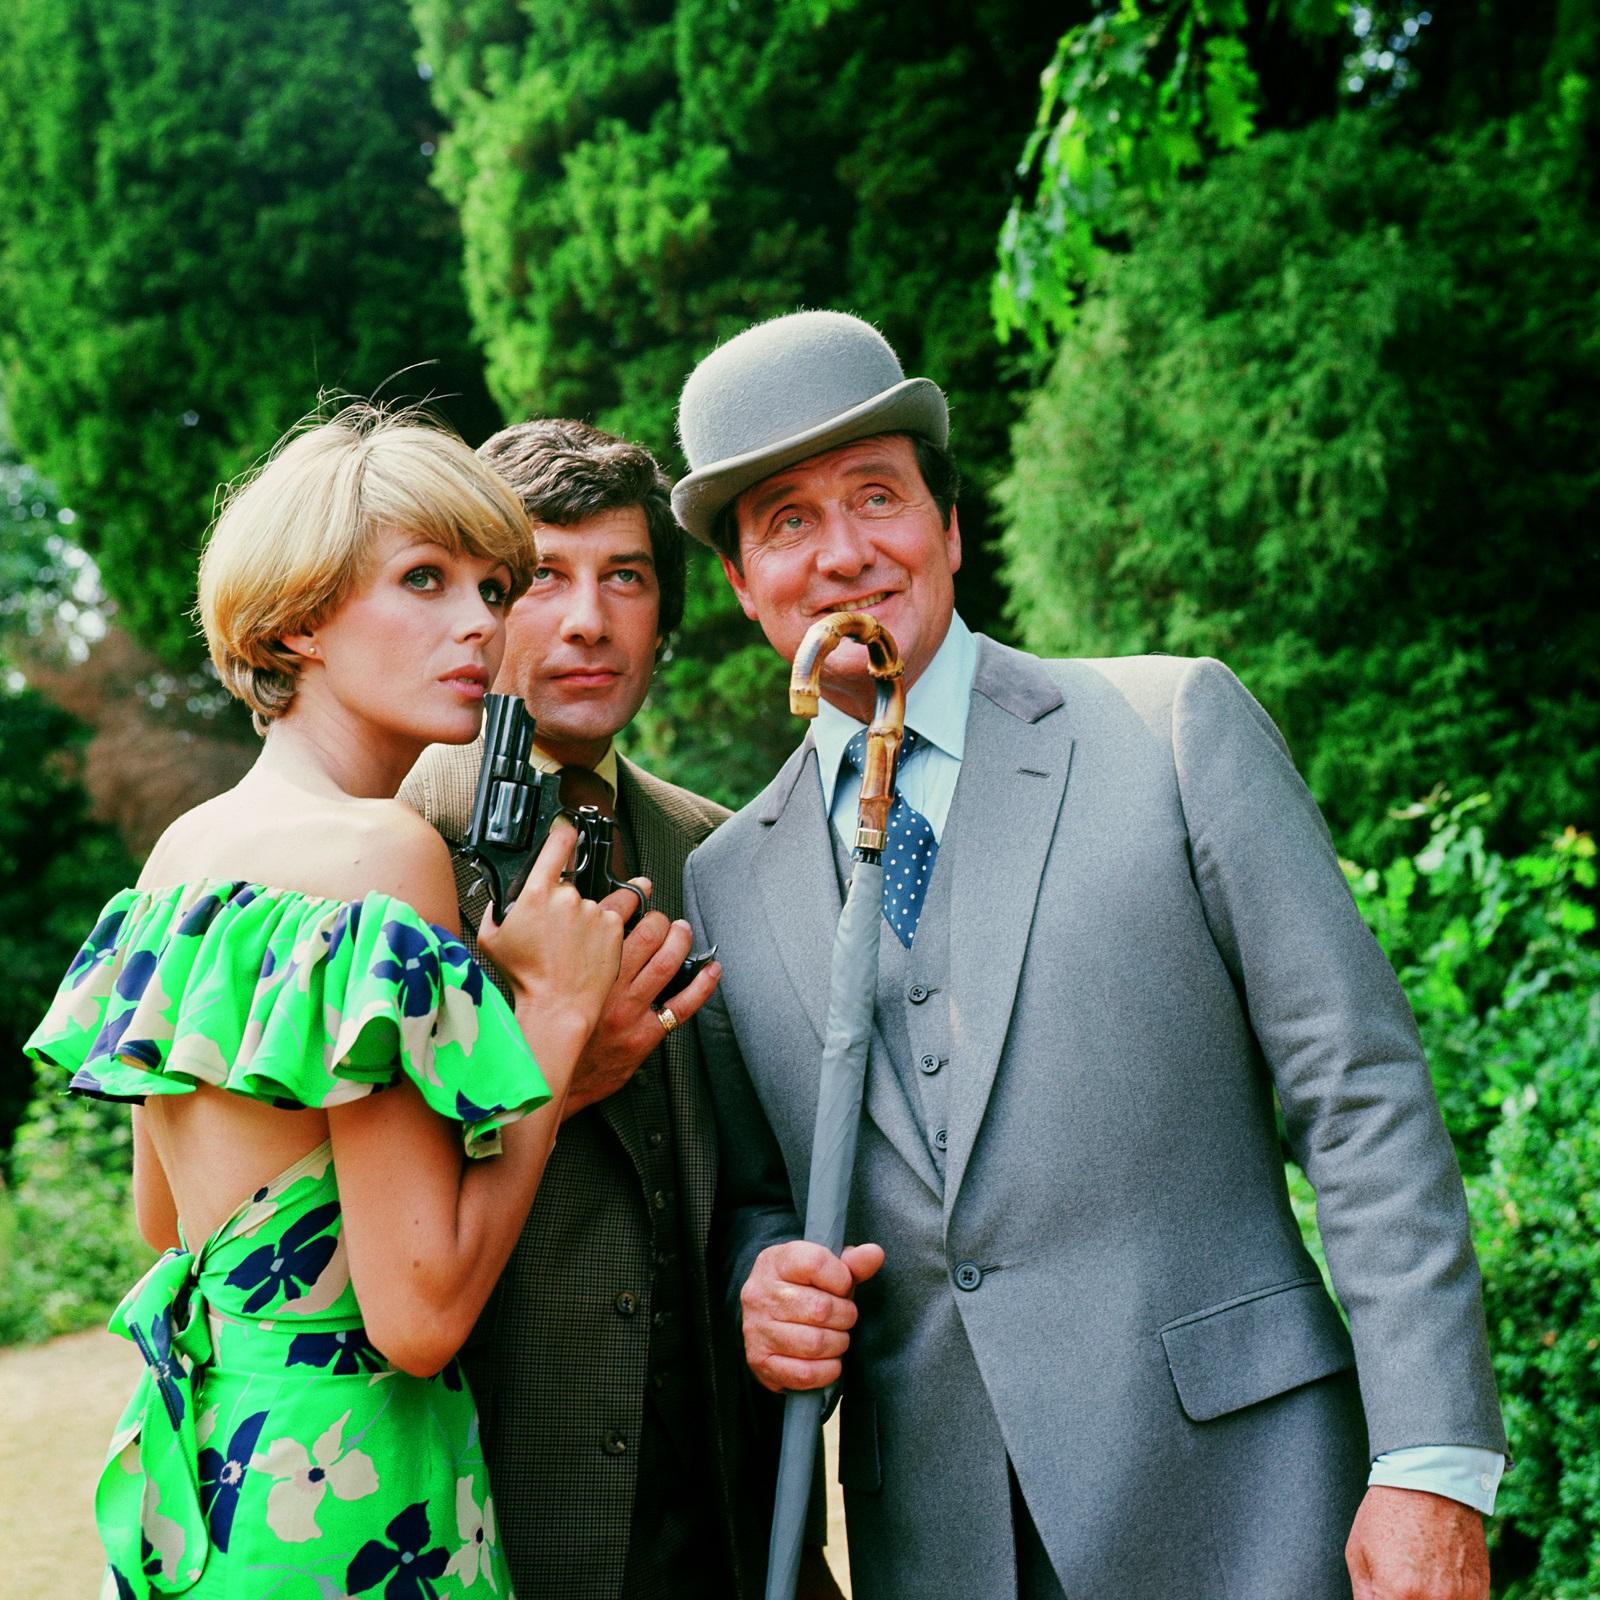 Patrick Macnee, Joanna Lumley and Gareth Hunt